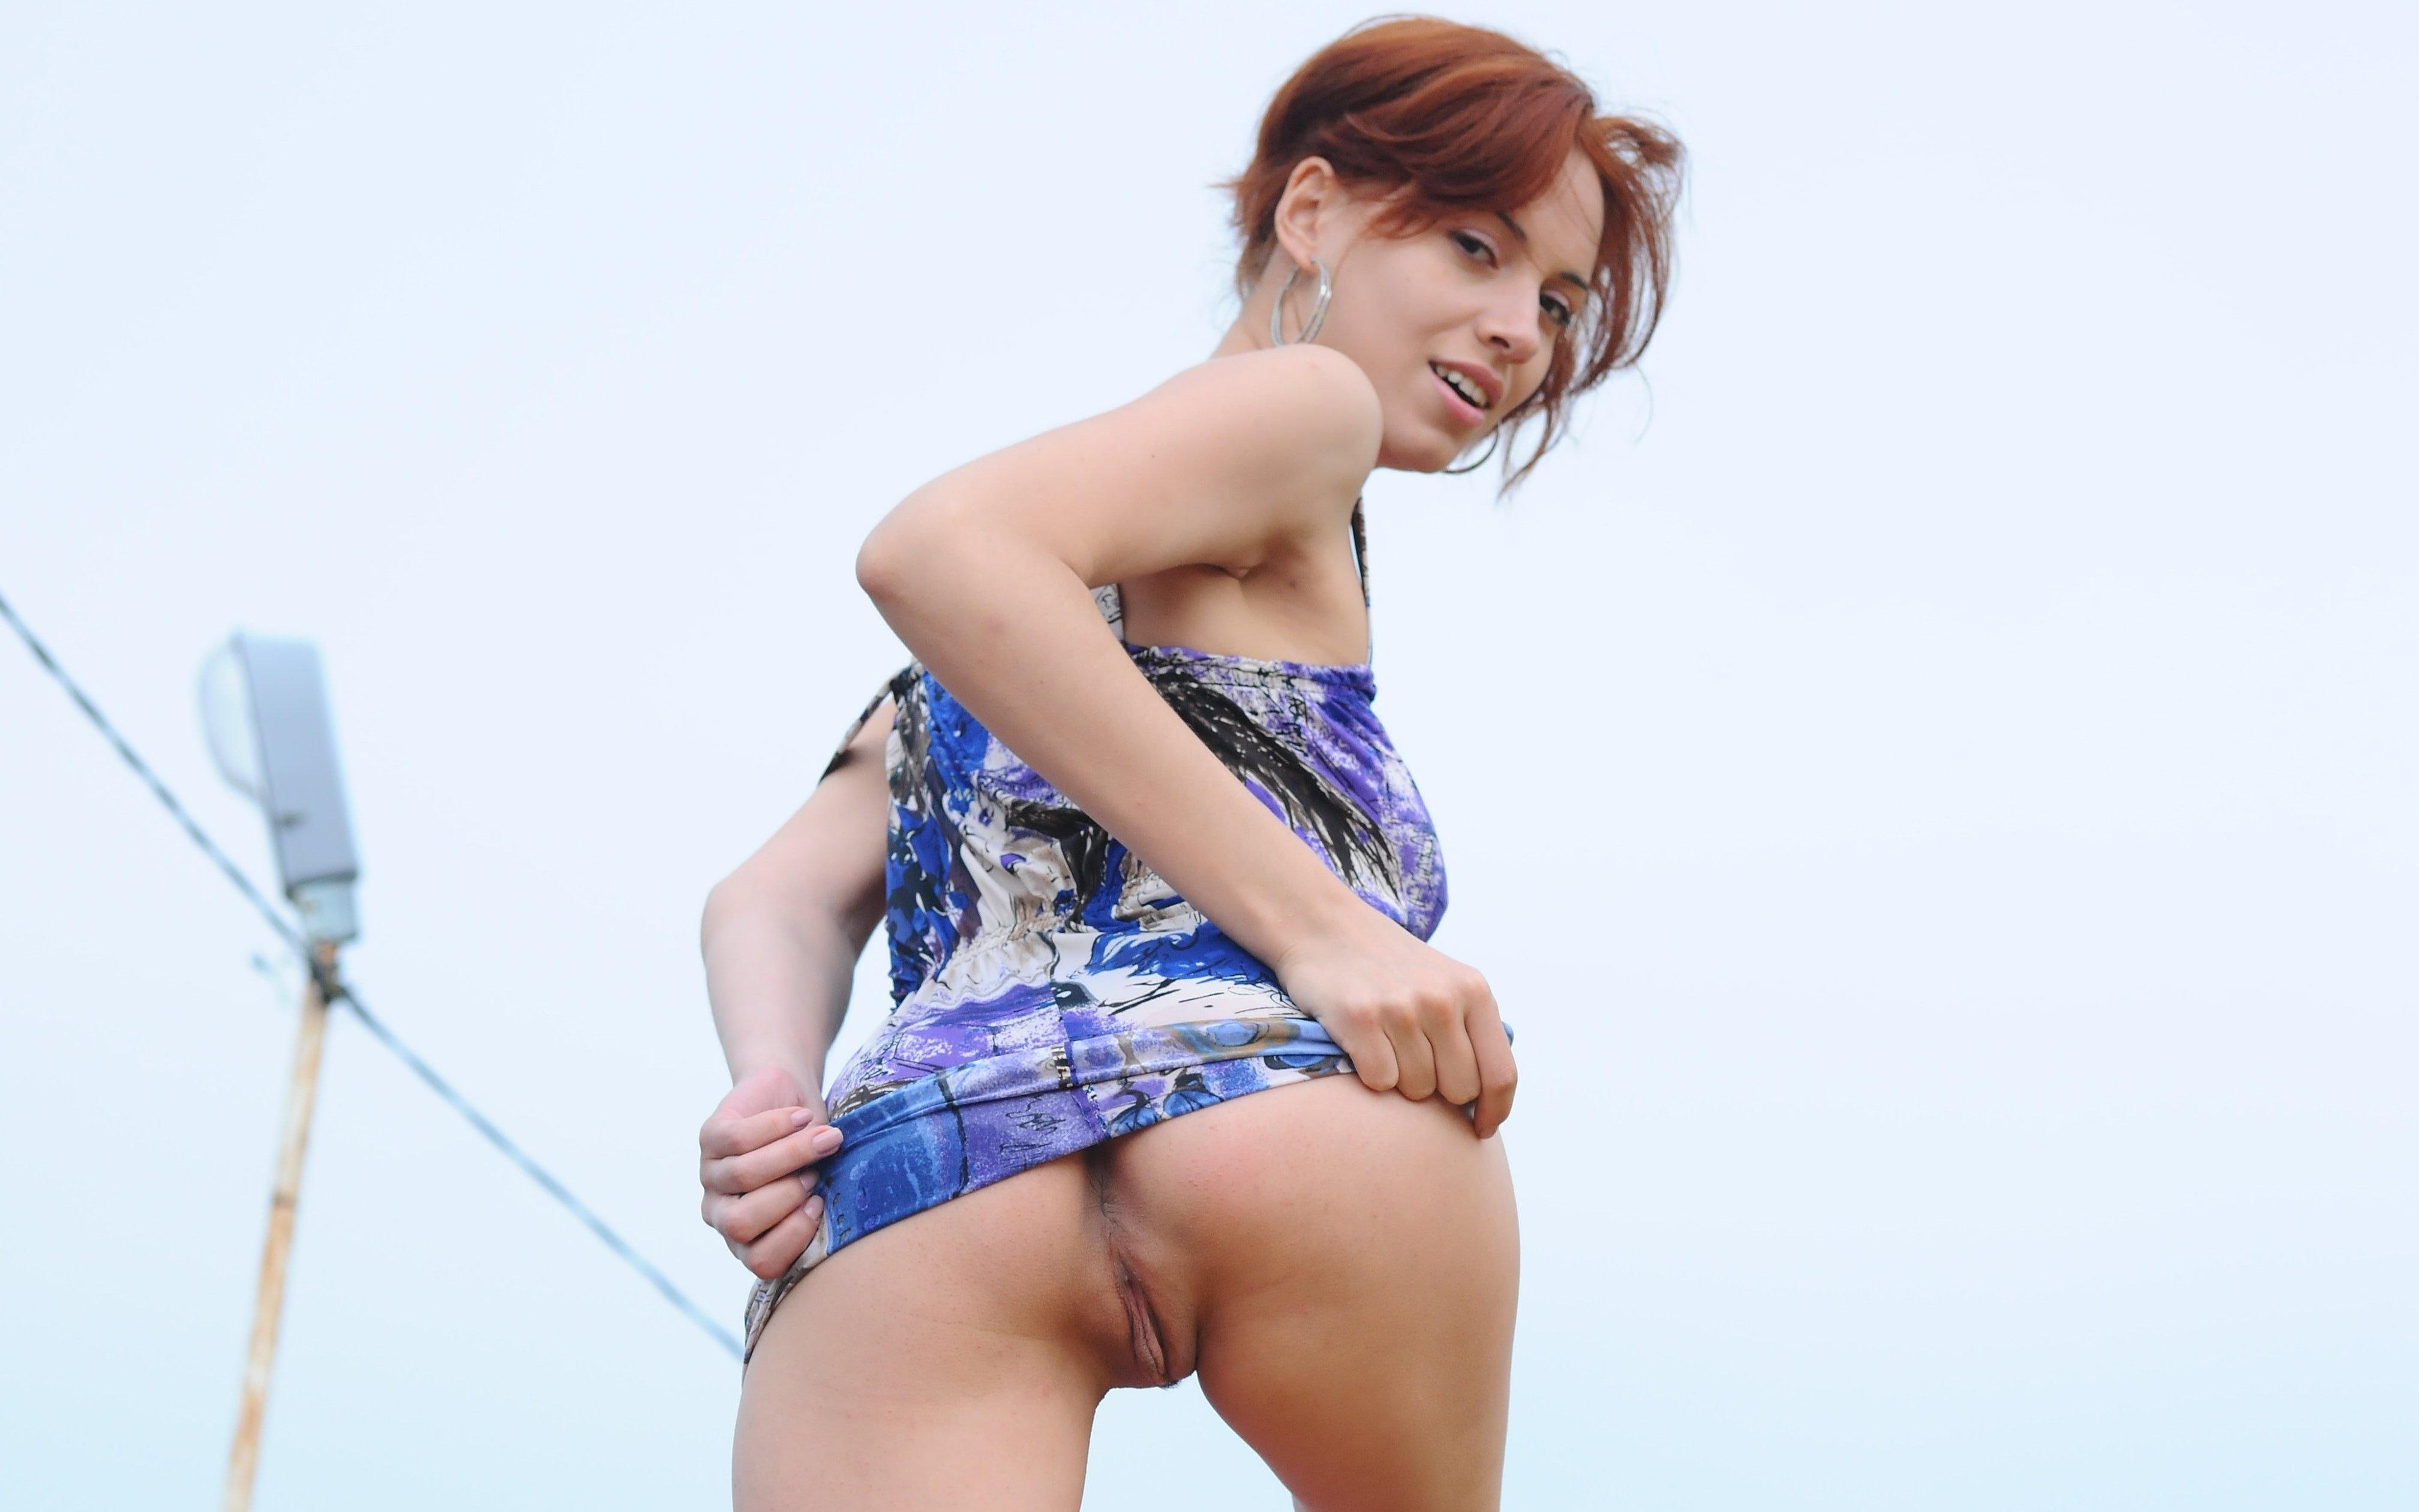 erotika-zadrala-yubku